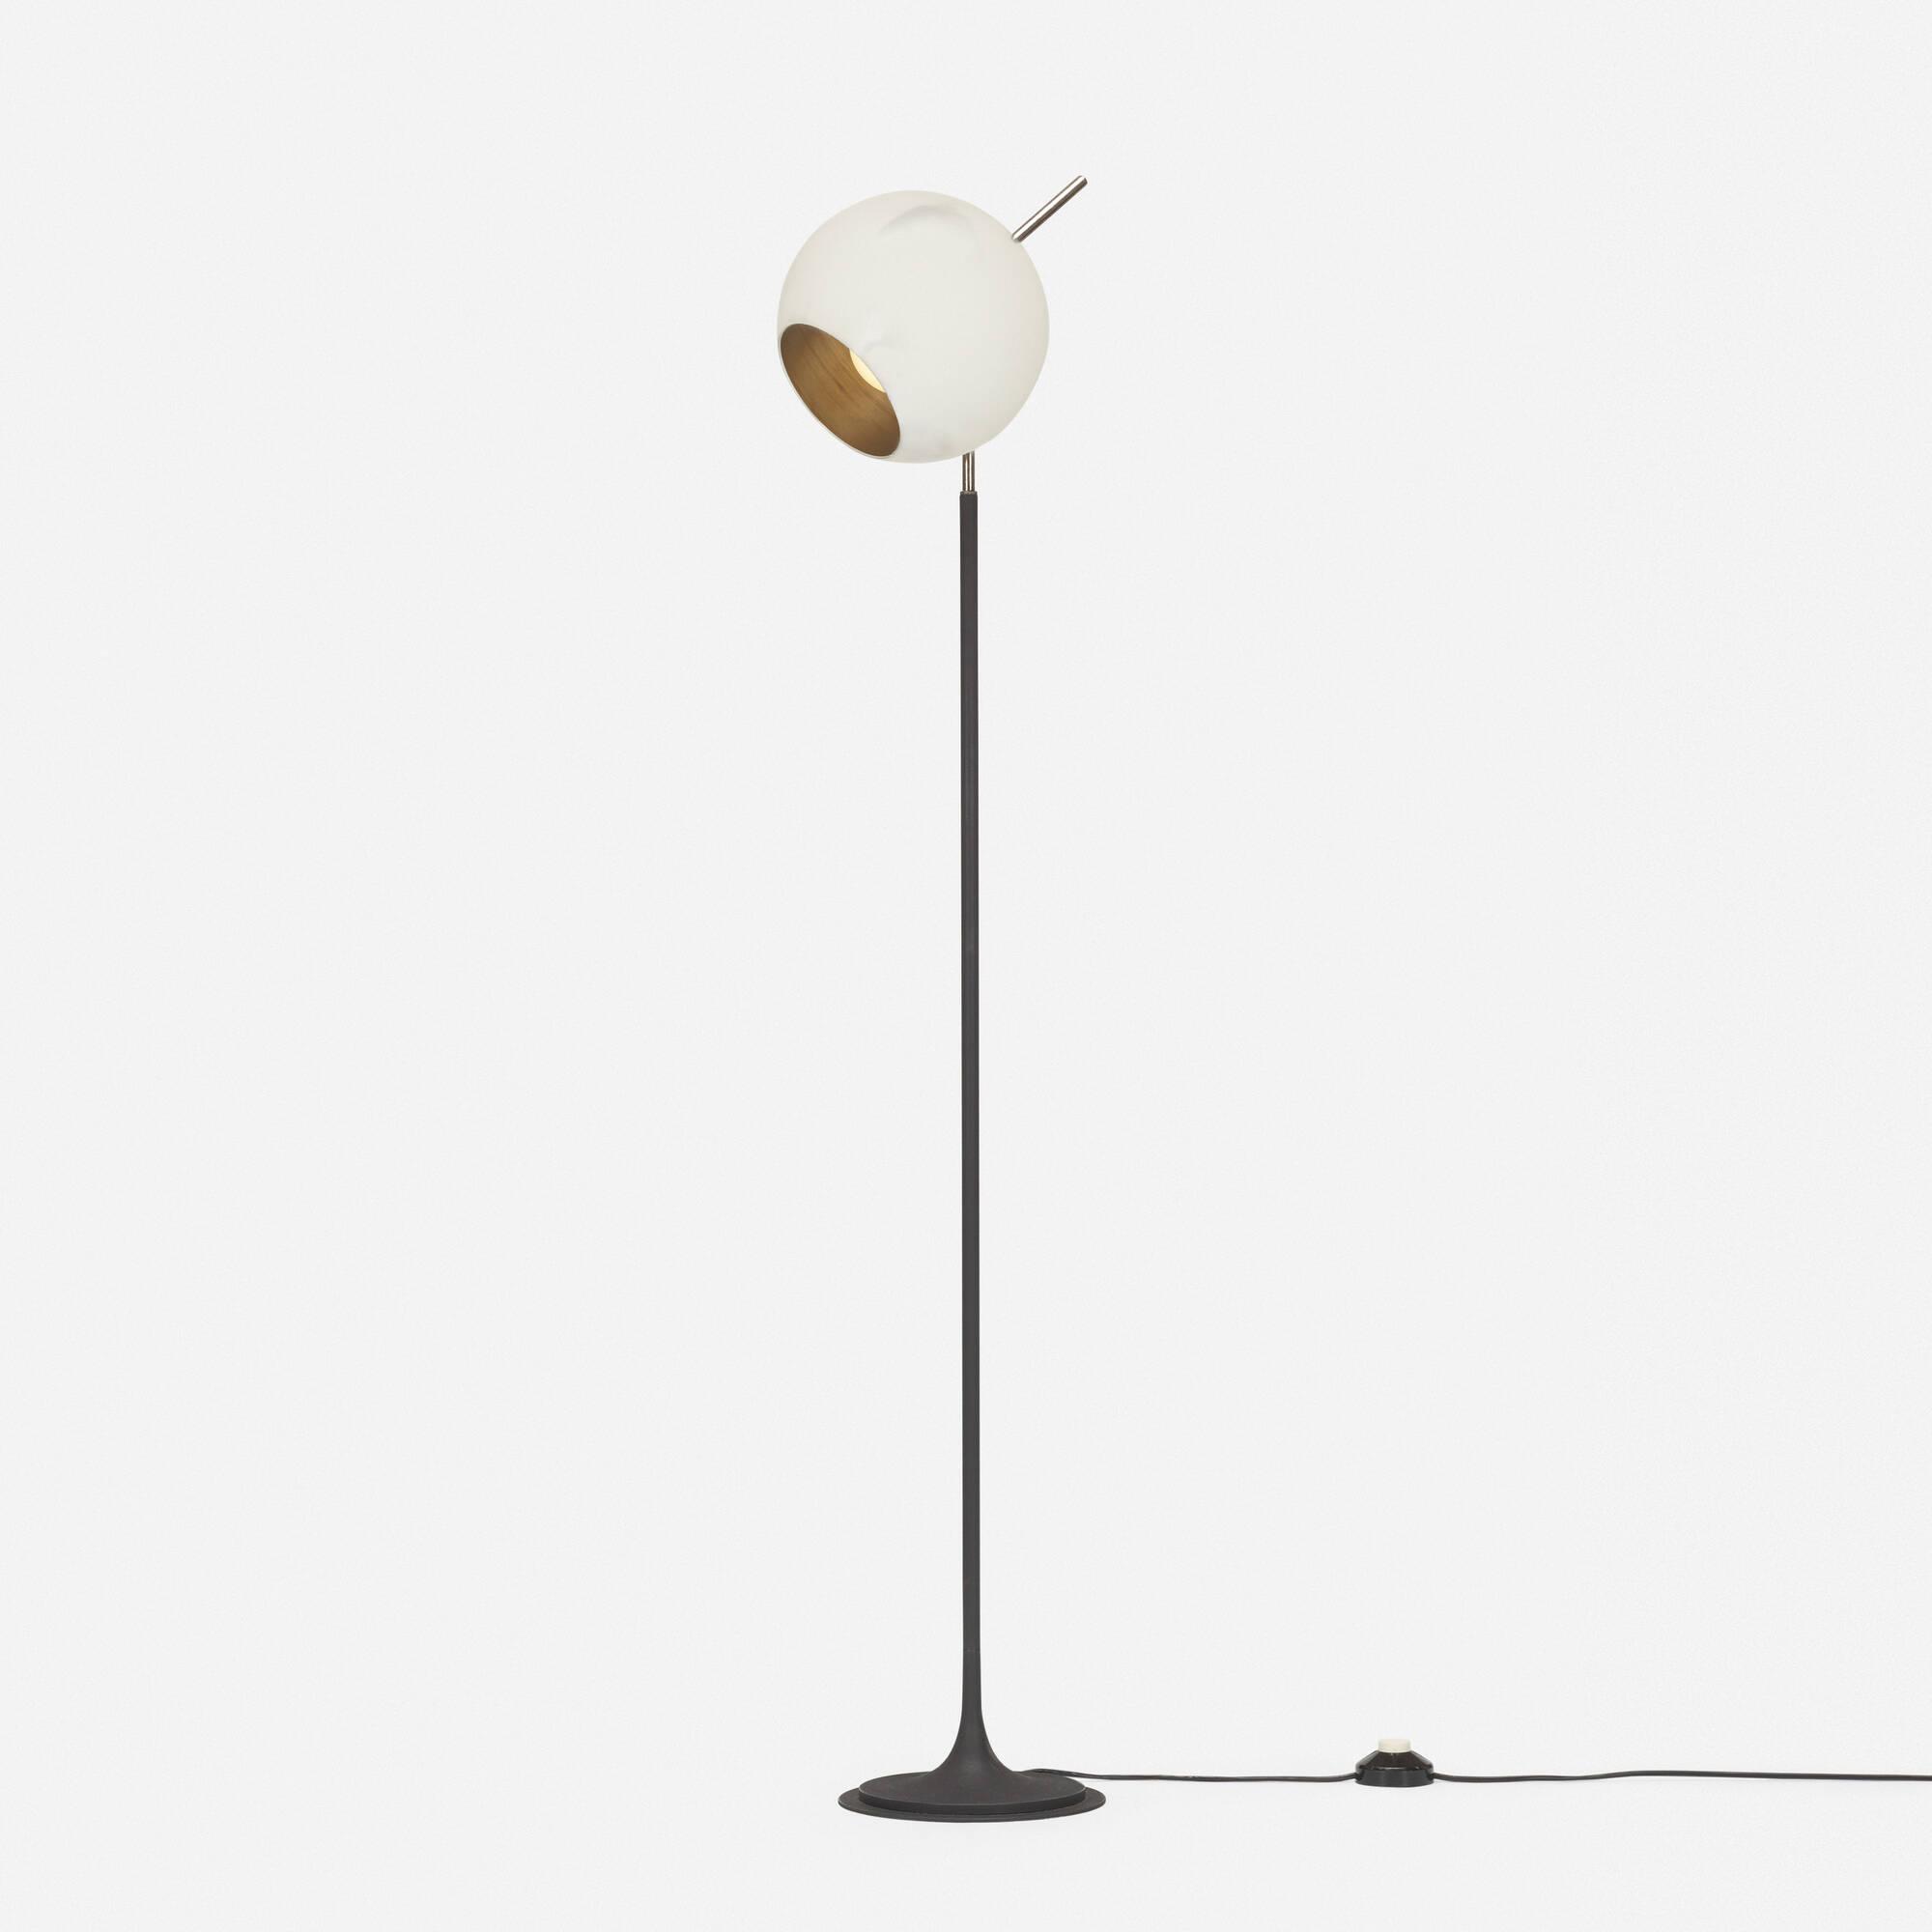 286: Gino Sarfatti / floor lamp, model 1082 N (1 of 3)